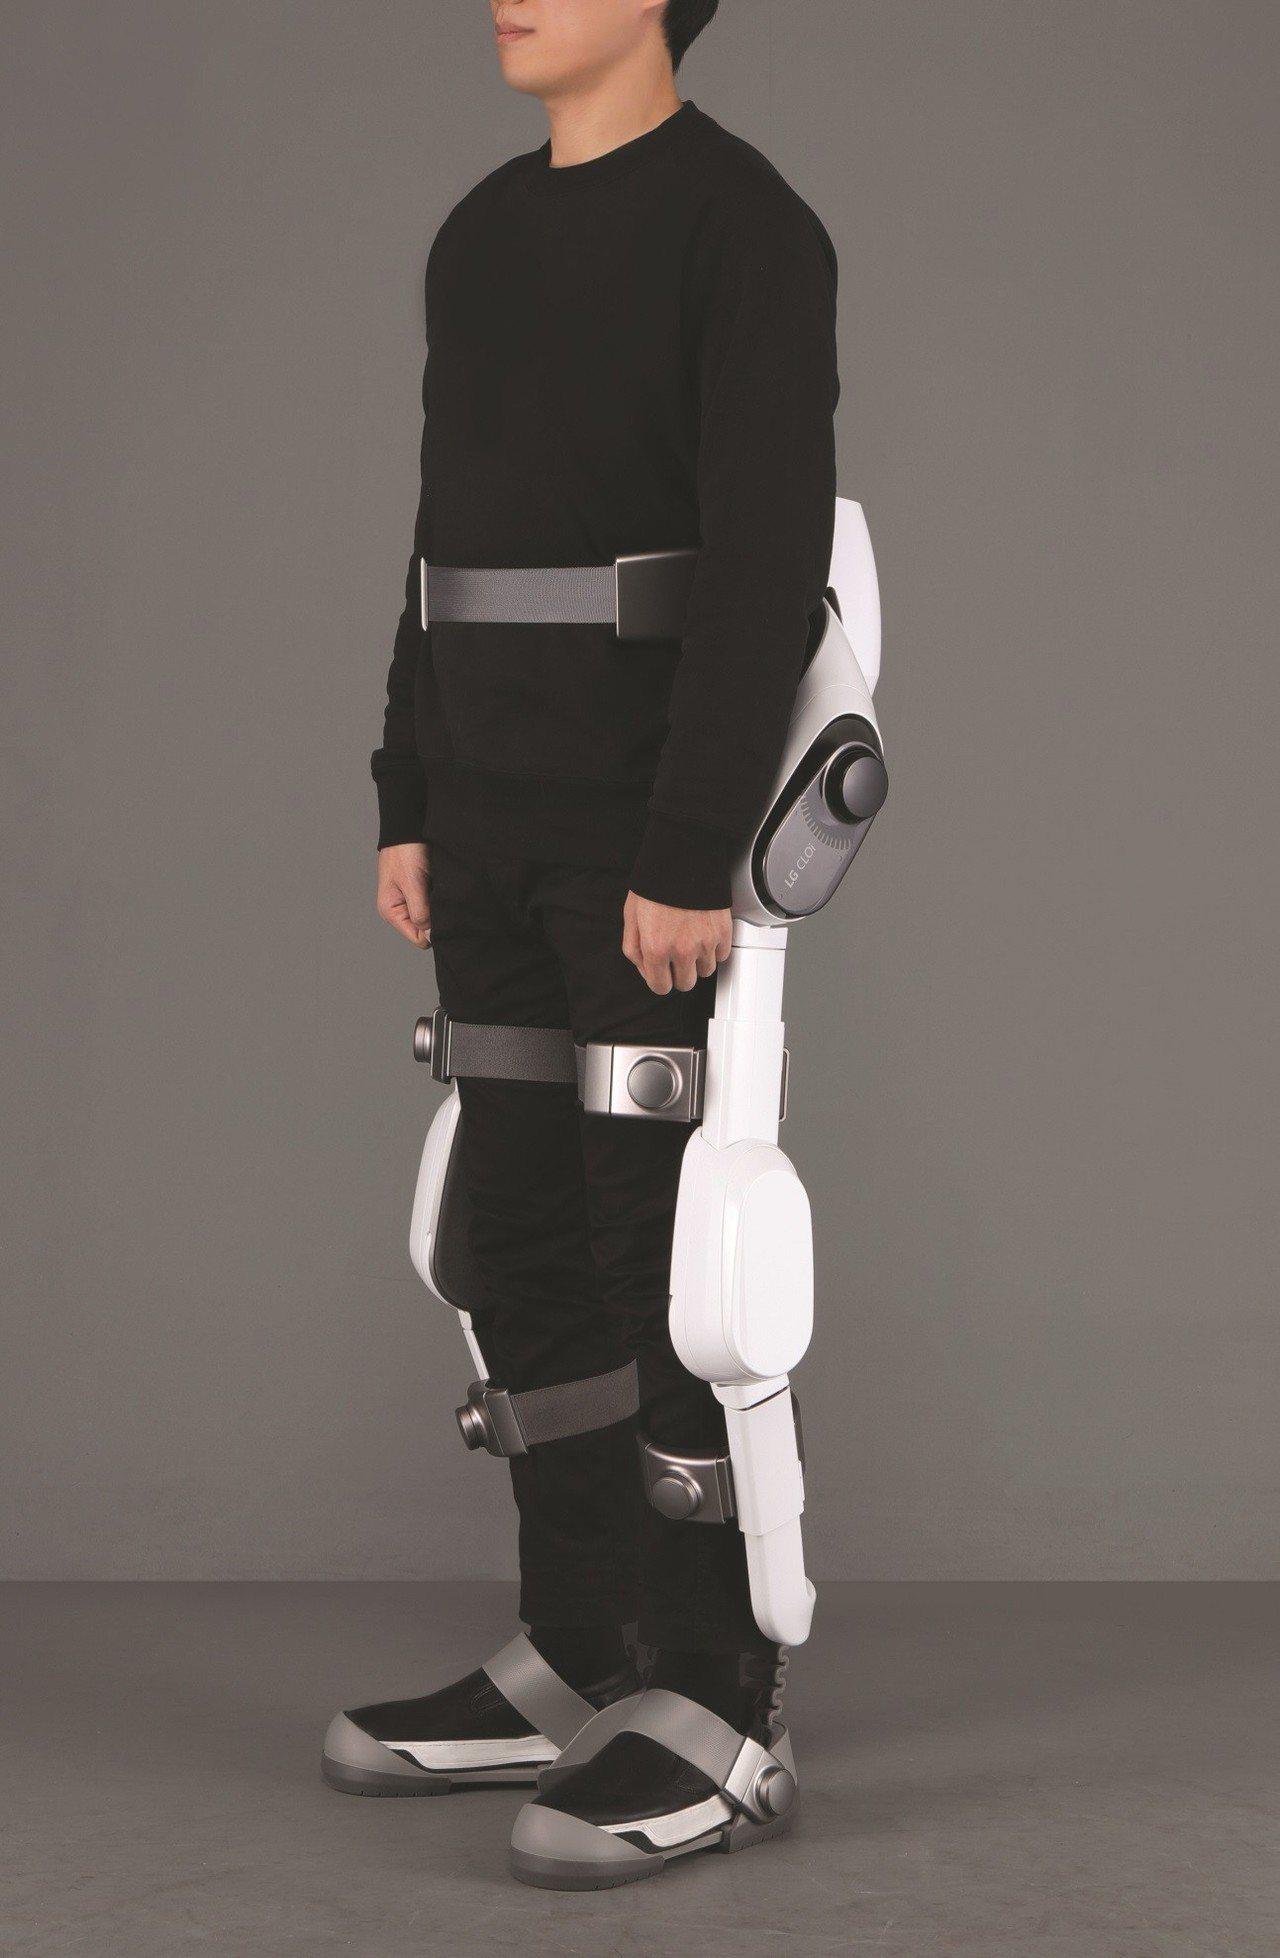 CLOi SuitBot涼鞋式設計與自動調整功能可供穿戴者輕鬆穿脫。圖/LG提供